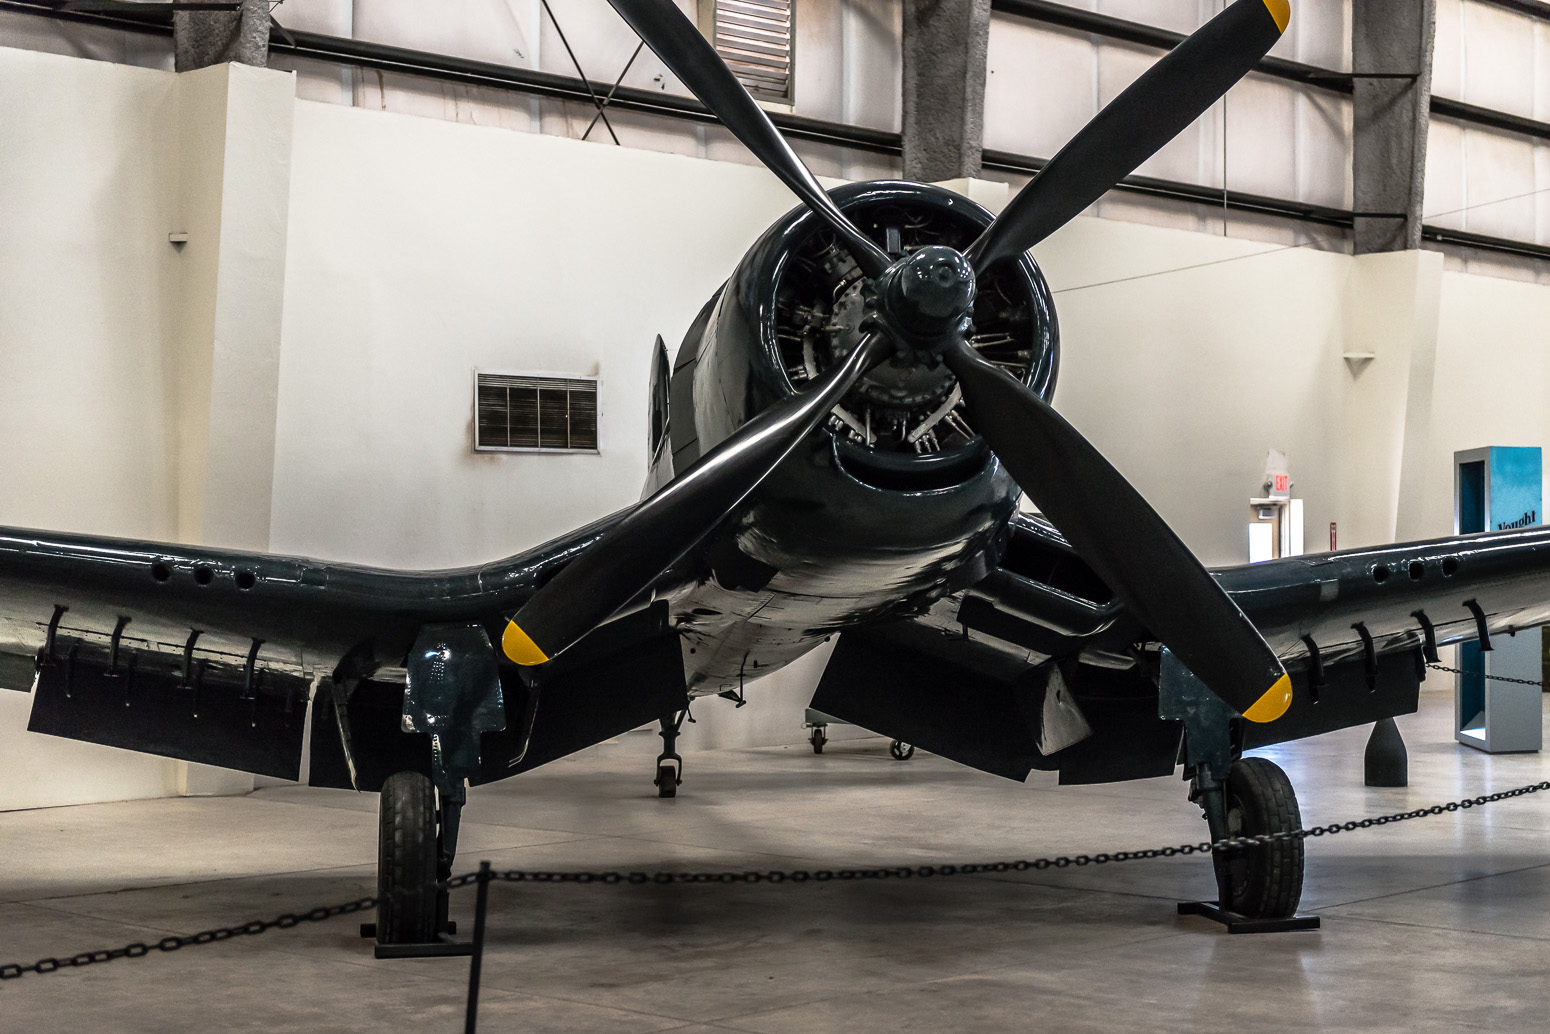 Chance Vought F4U Corsair, Pima Air & Space Museum , Tucson, USA